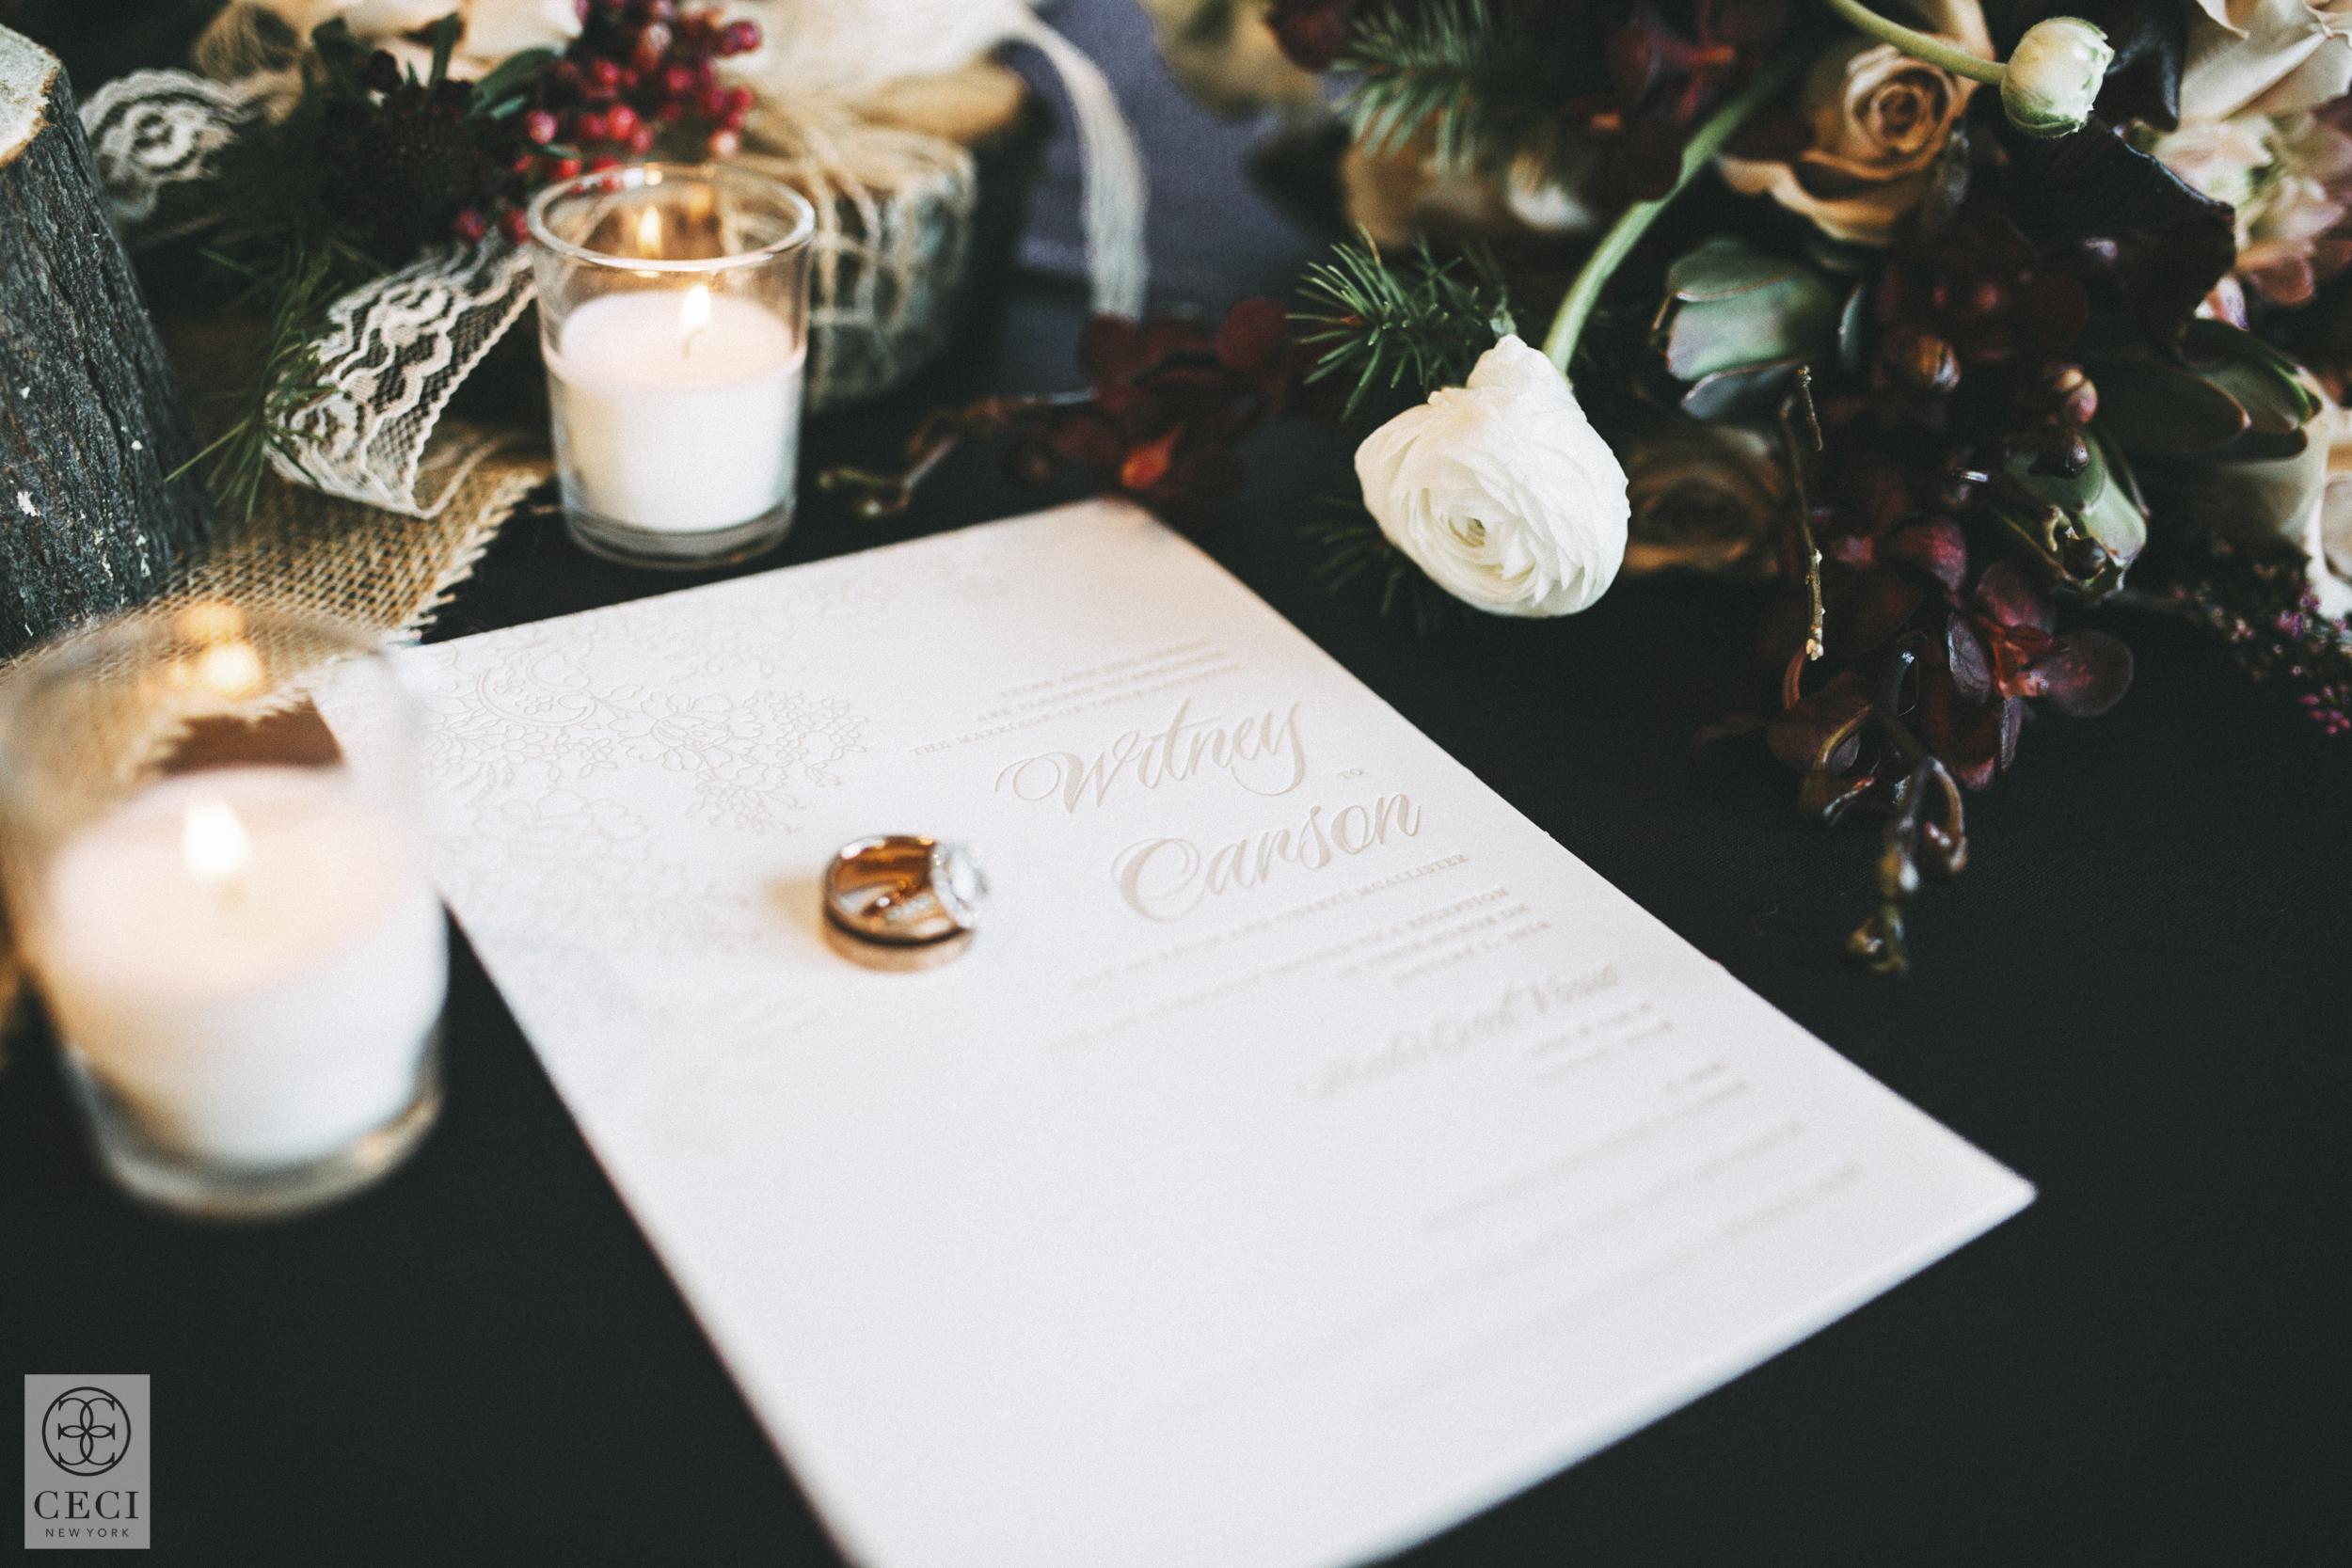 ceci_new_york_wedding_invitation_design_black_red_dramatic_macabre_statement-4.jpg